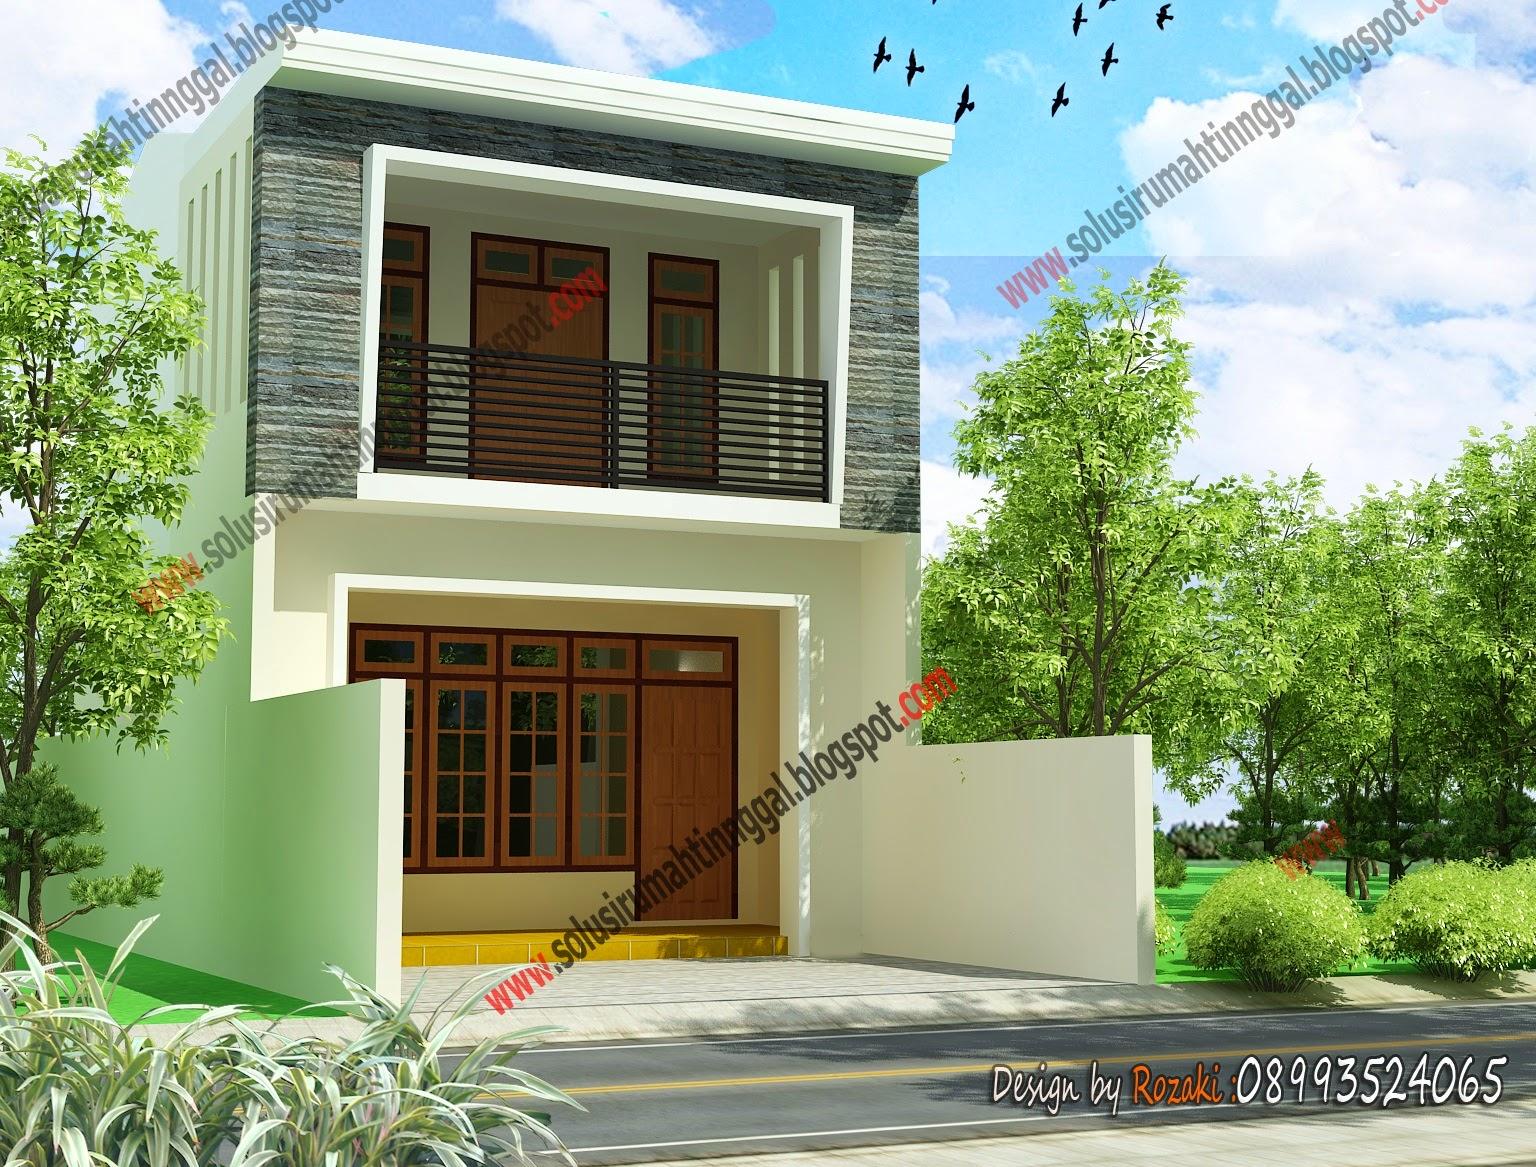 Model Rumah Minimalis Sederhana Satu Lantai